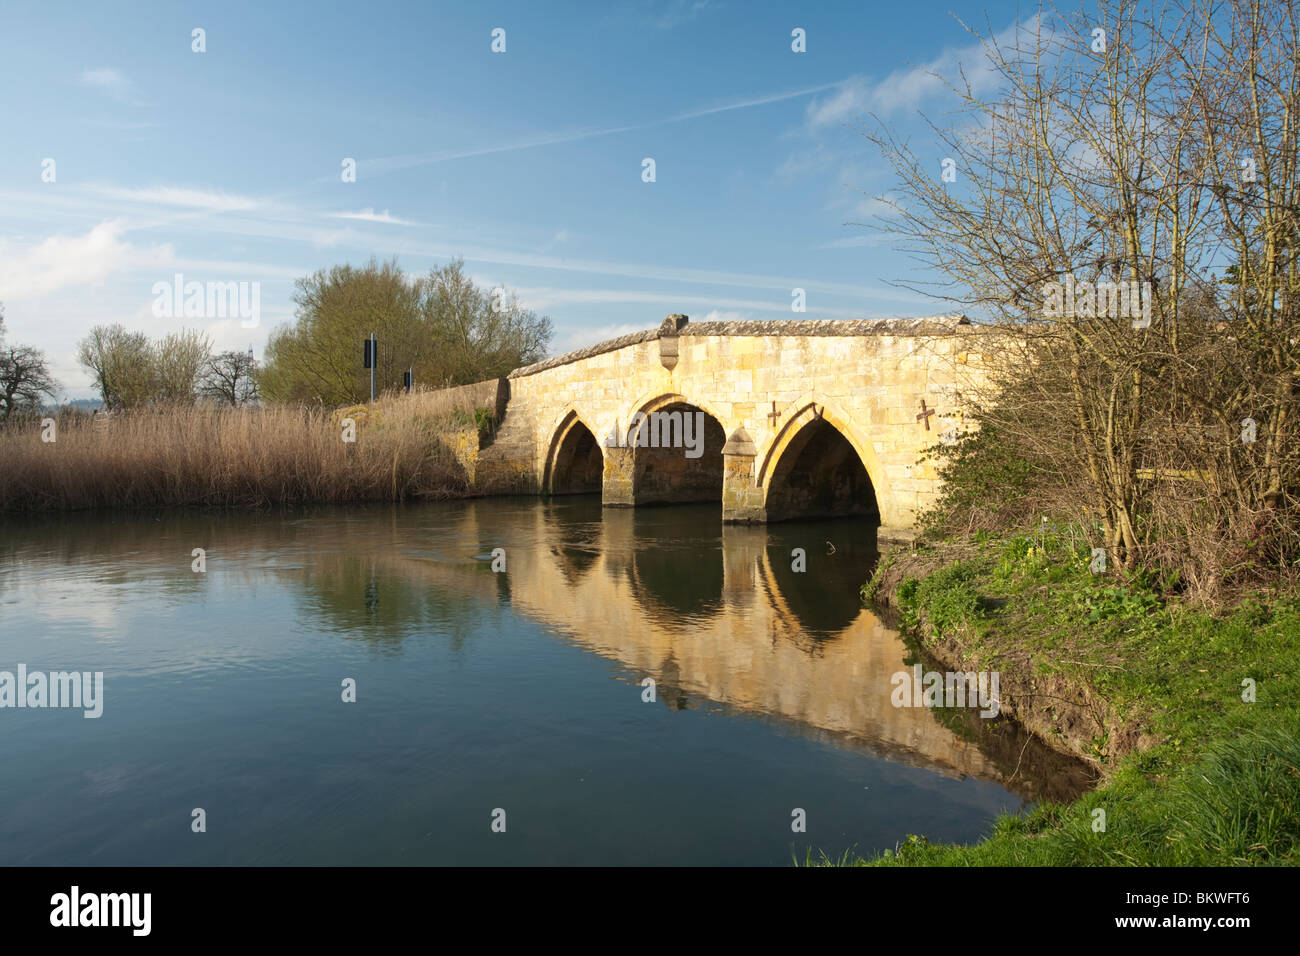 Radcot road bridge on the River Thames, Oxfordshire, Uk - Stock Image